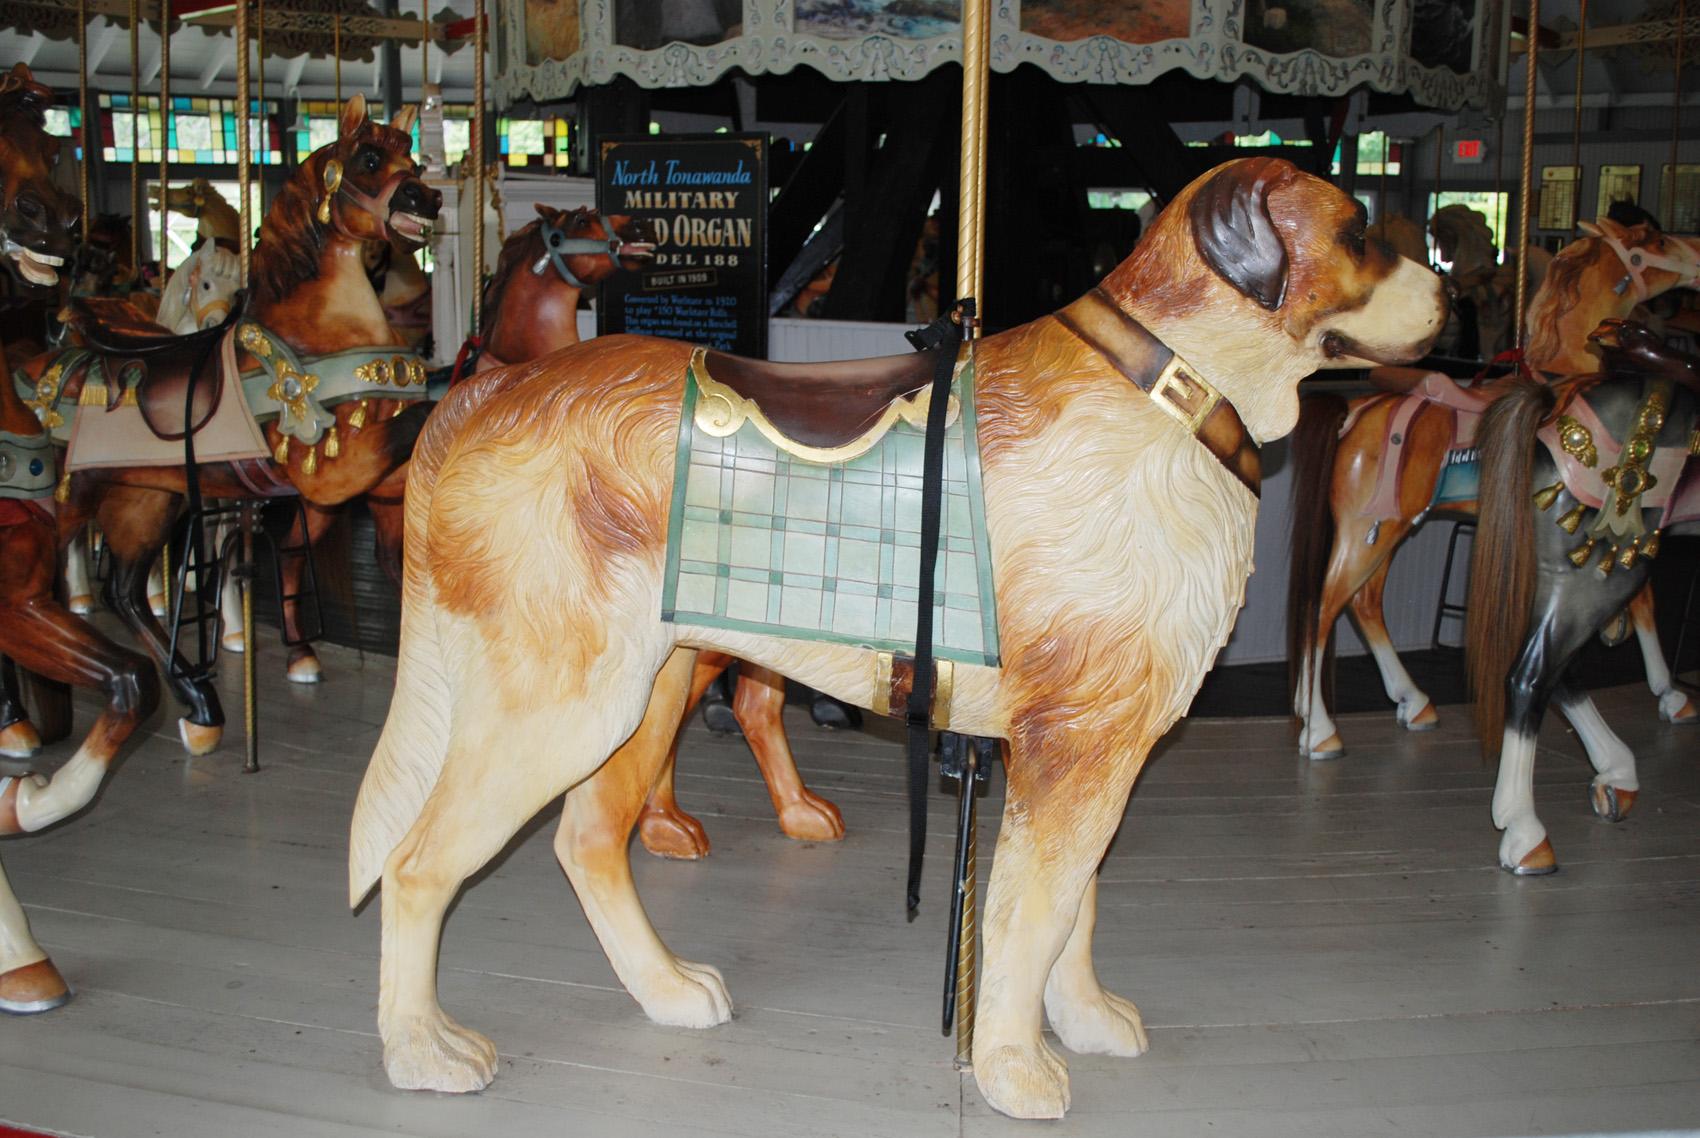 Ca-1895-Slater-Park-Looff-carousel-dog-0